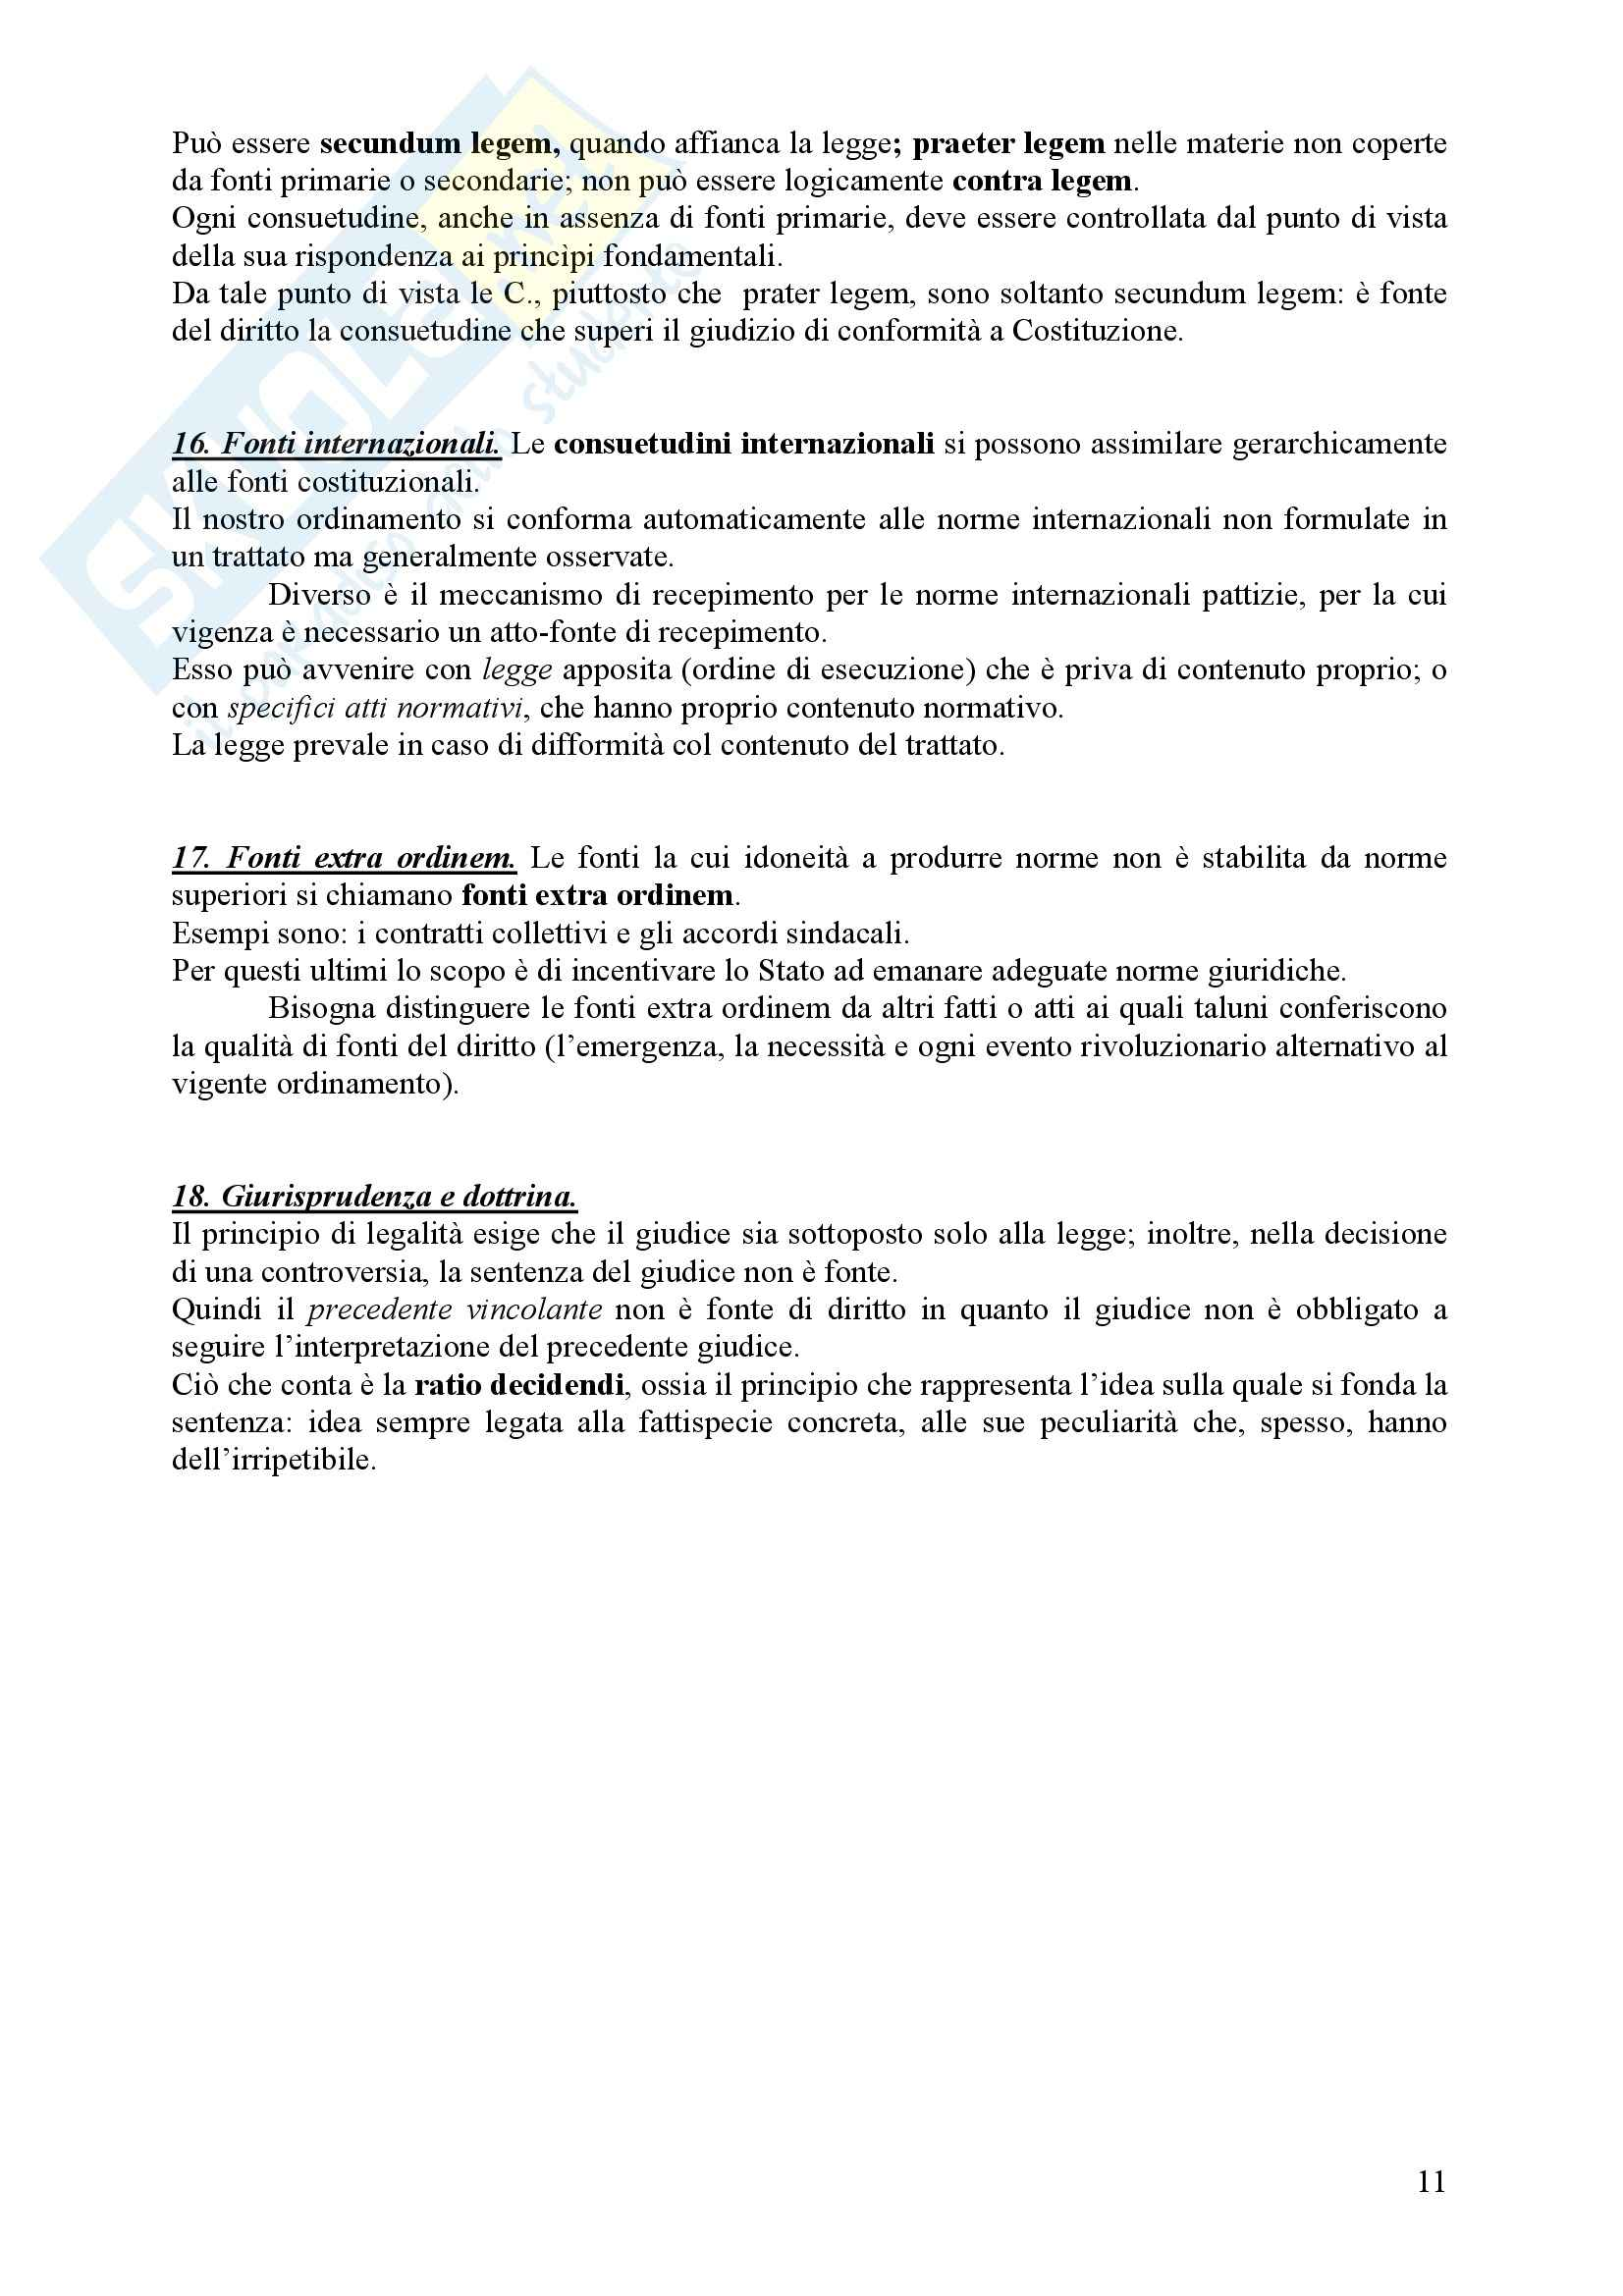 Diritto Civile - Perlingieri – Parte prima – Riassunto esame Pag. 11